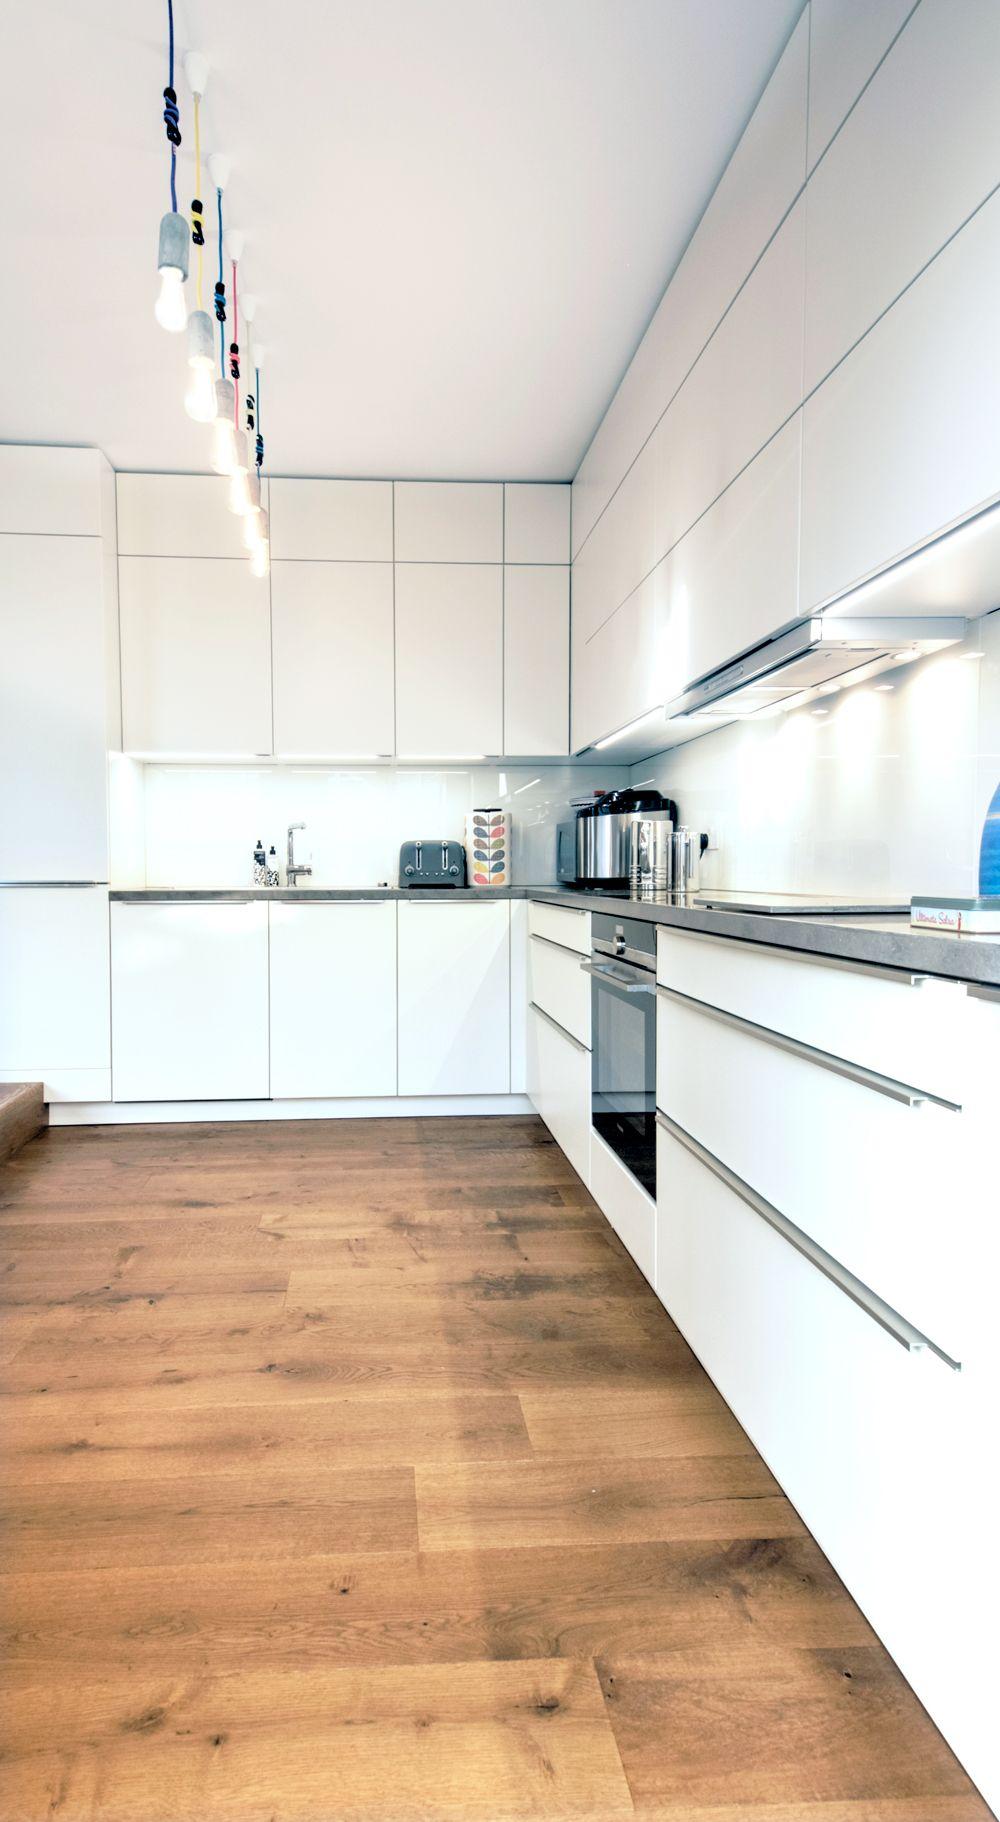 Portfolio (With images) Kitchen inspirations, German